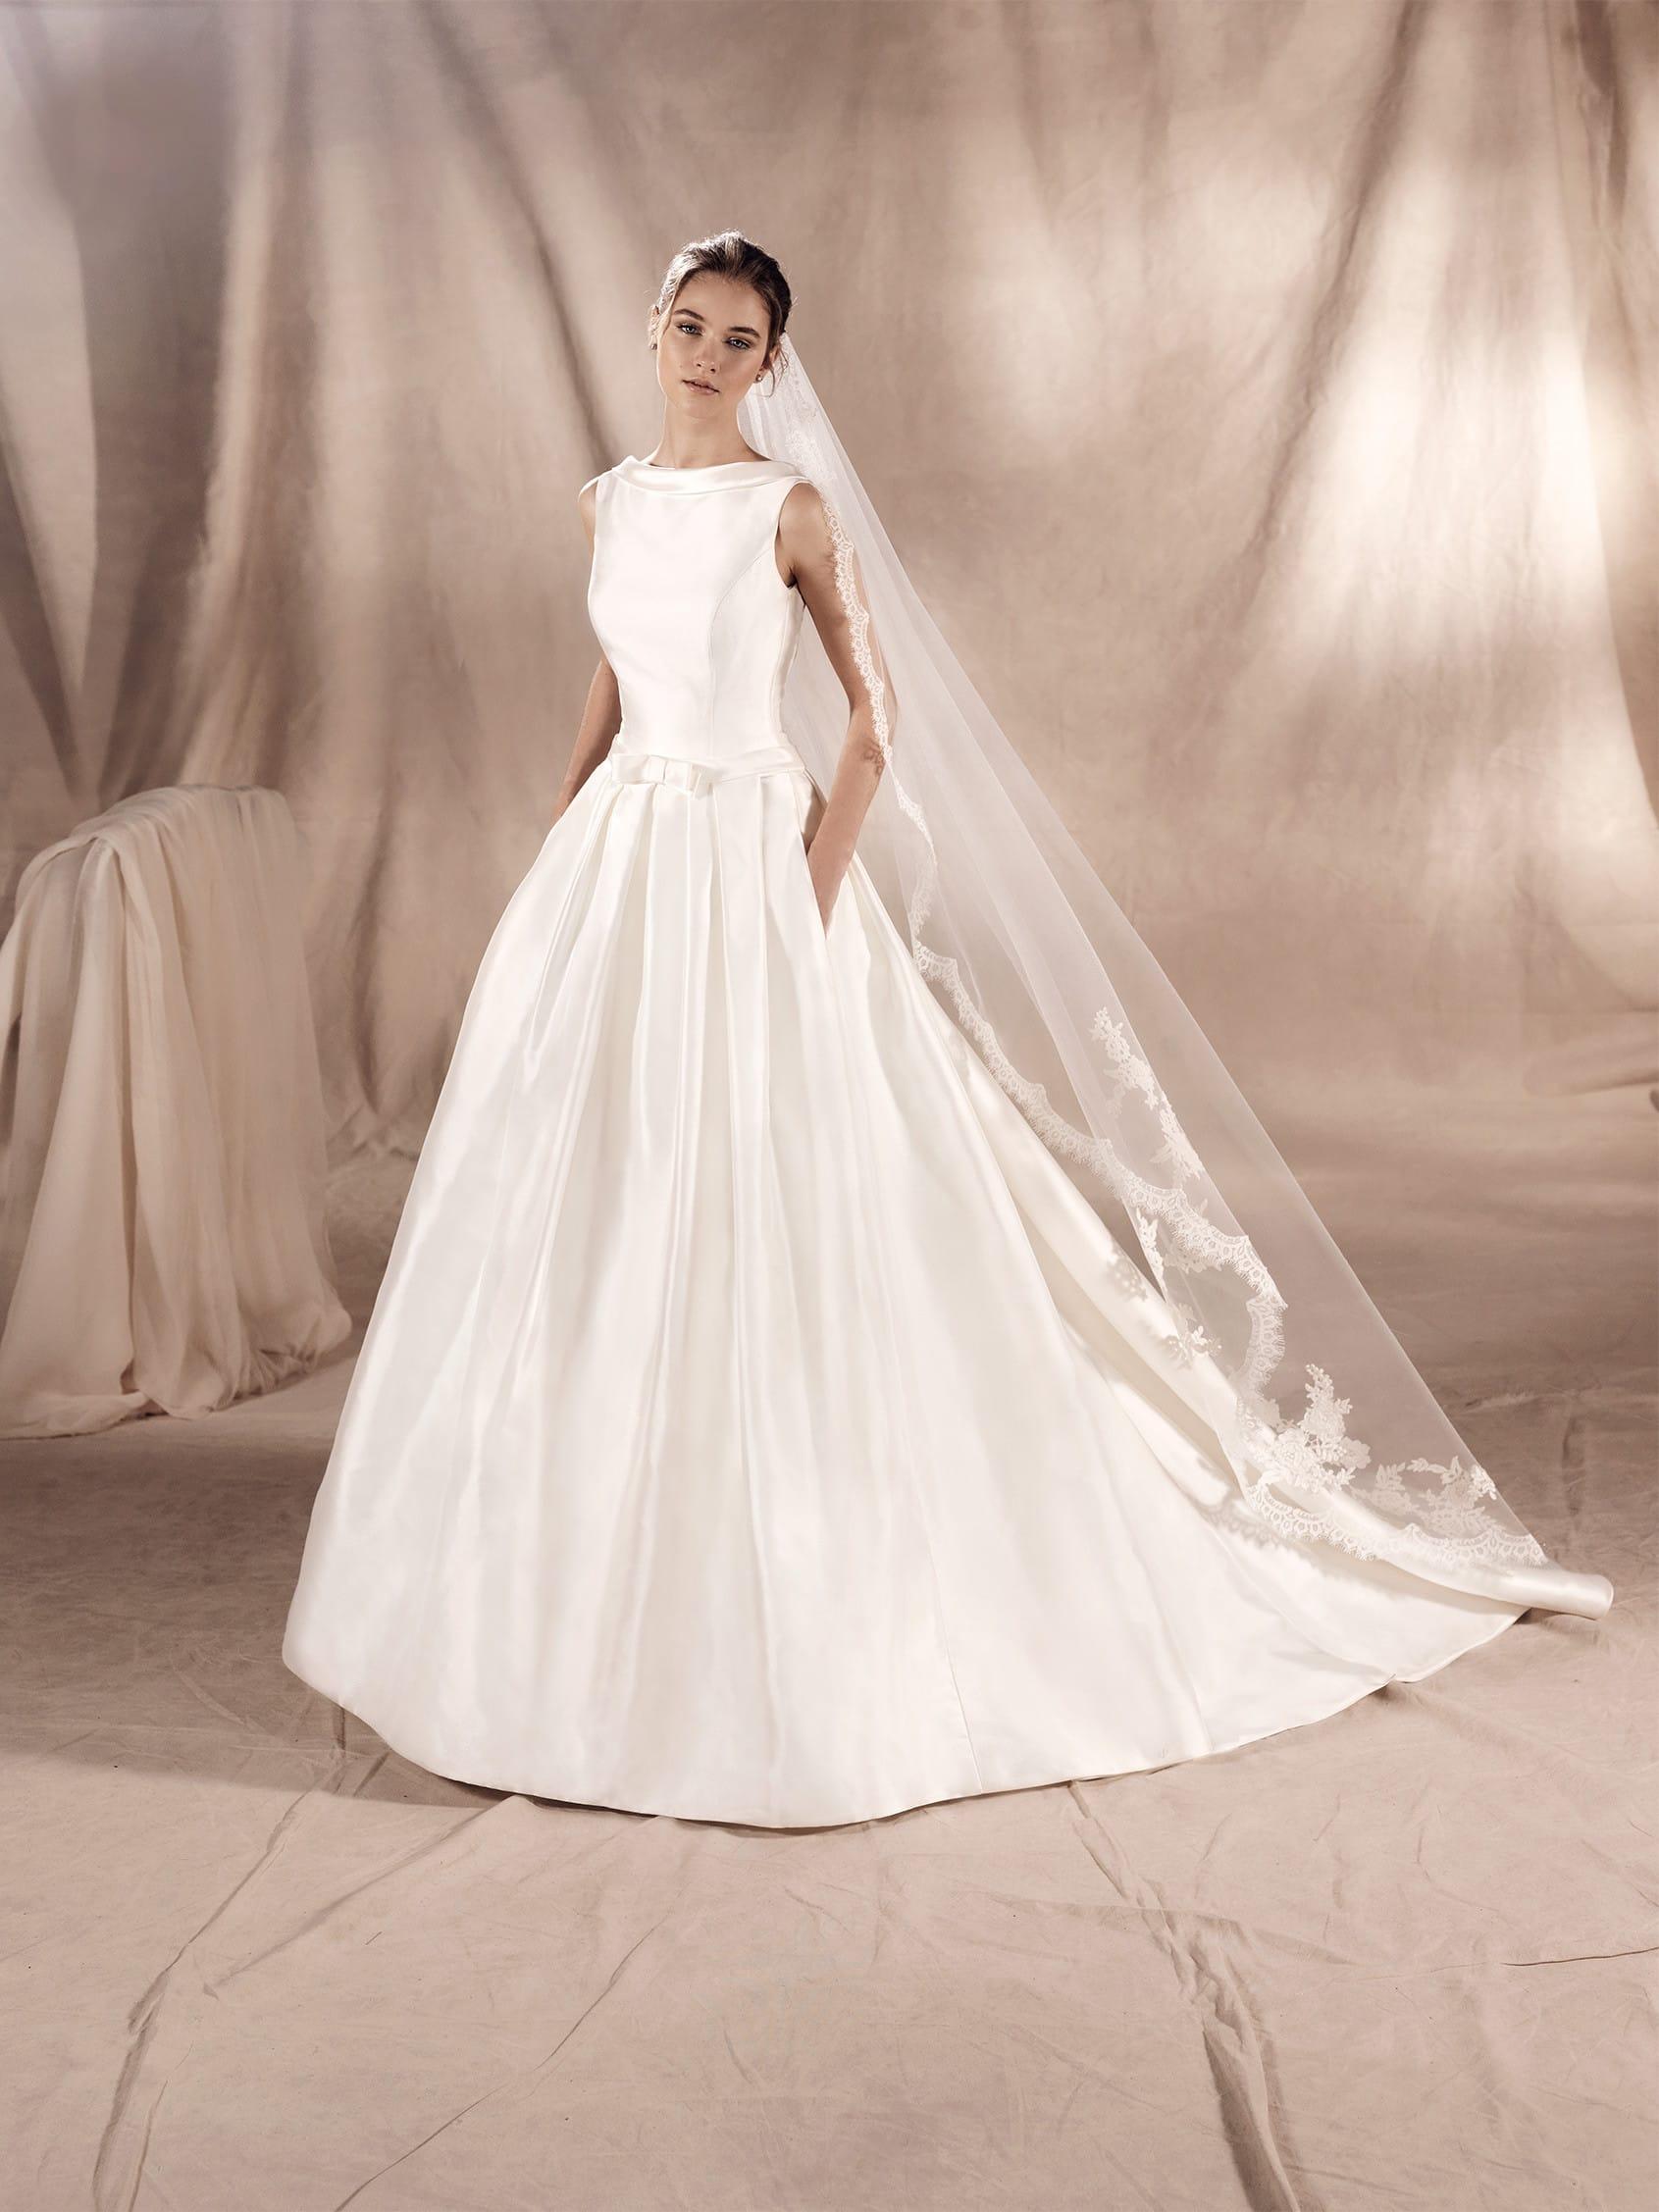 Robe de mariée Sabrina White One collection 2018. Paris